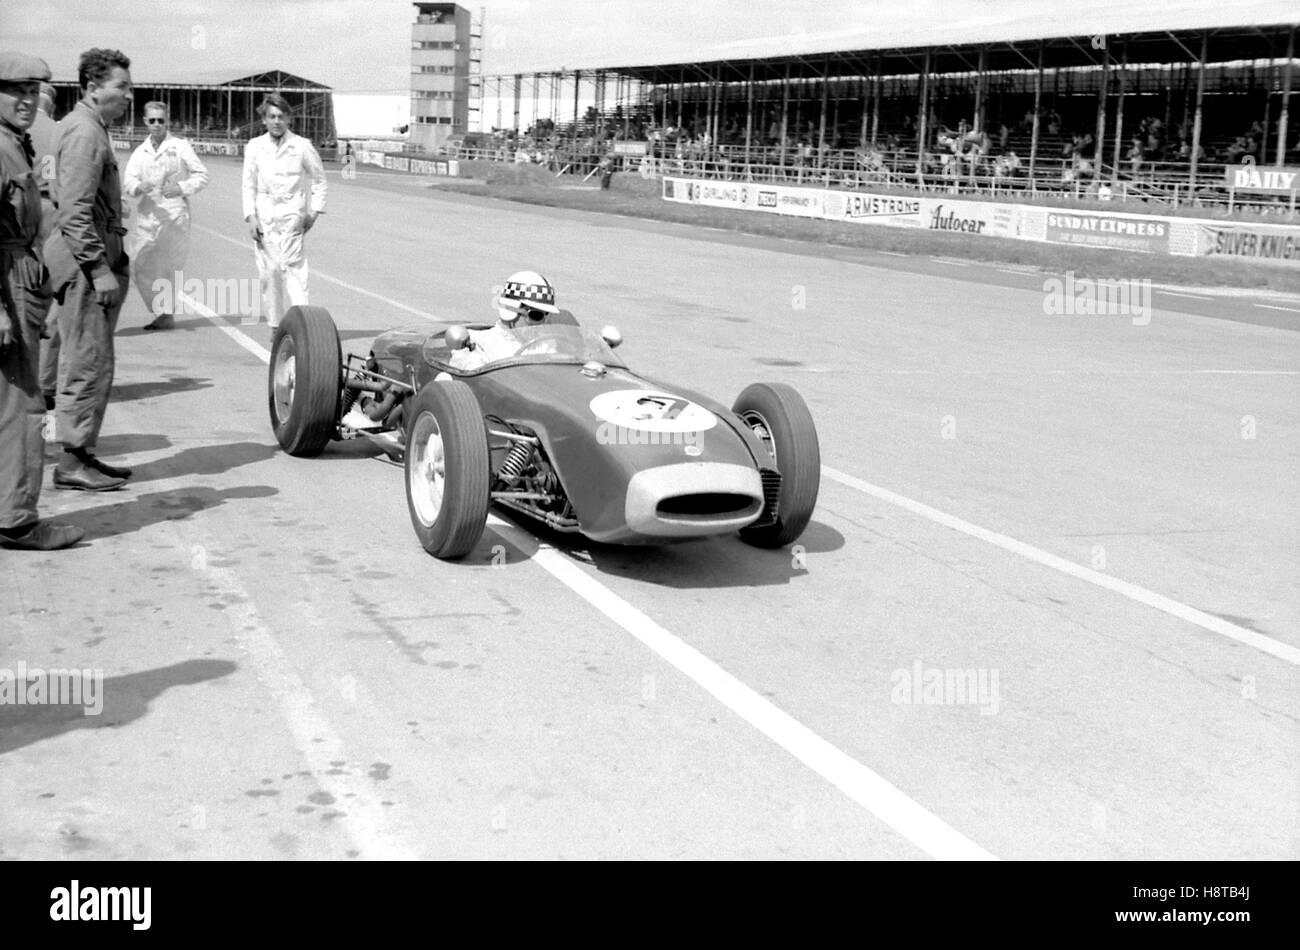 1960 BRITISH GP IRELAND LOTUS 18 JIM ENDRUWEIT BACKGROUND - Stock Image